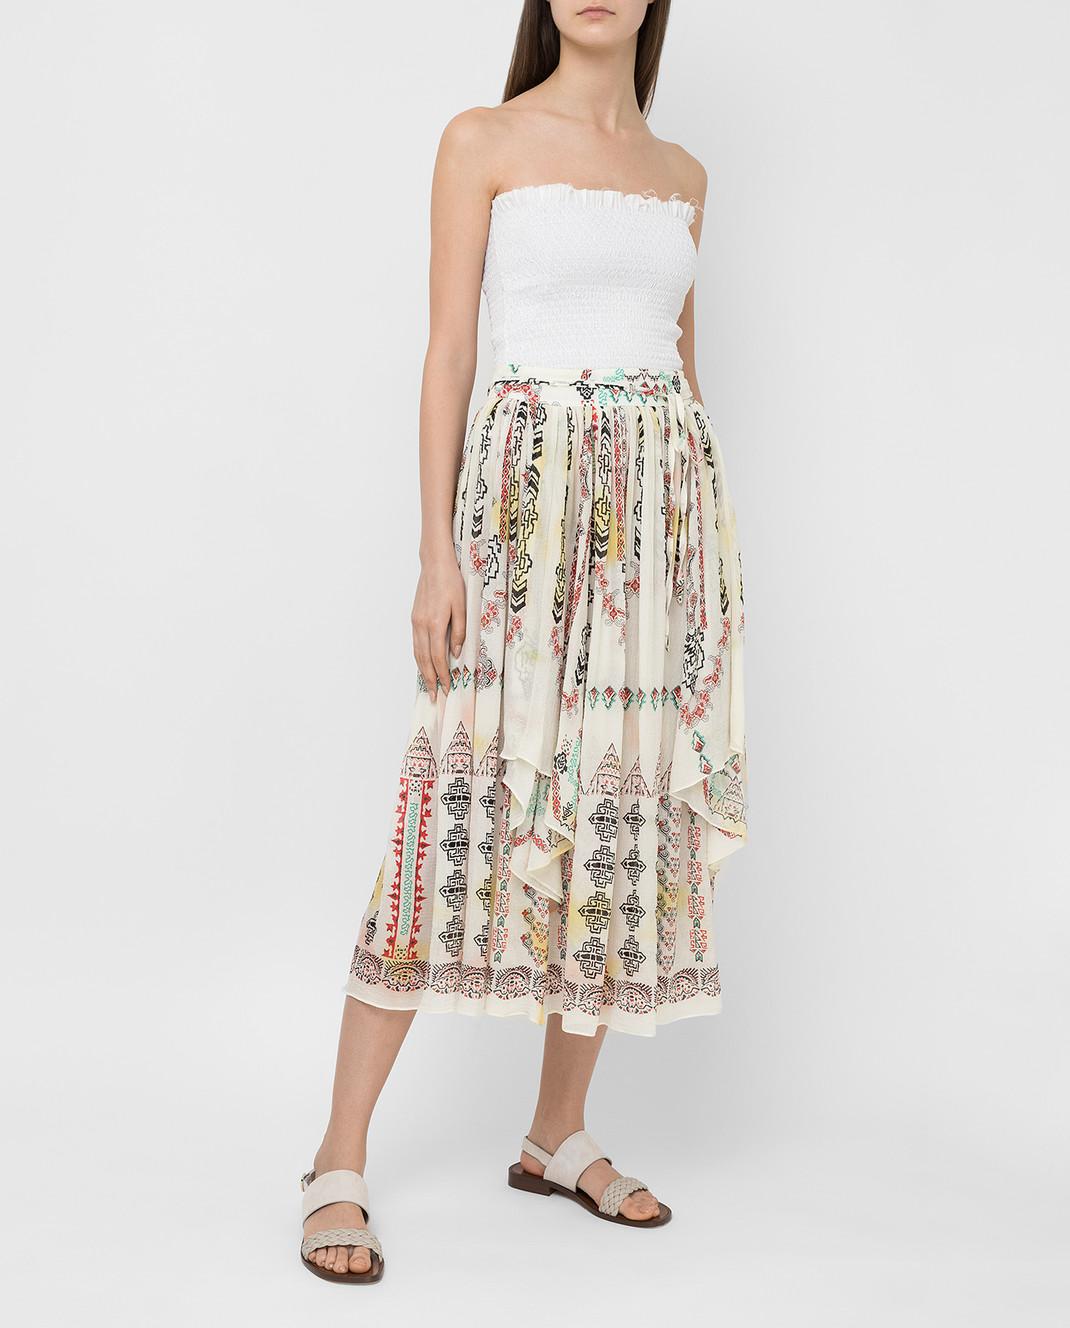 Etro Светло-бежевая юбка из шелка D18711 изображение 2